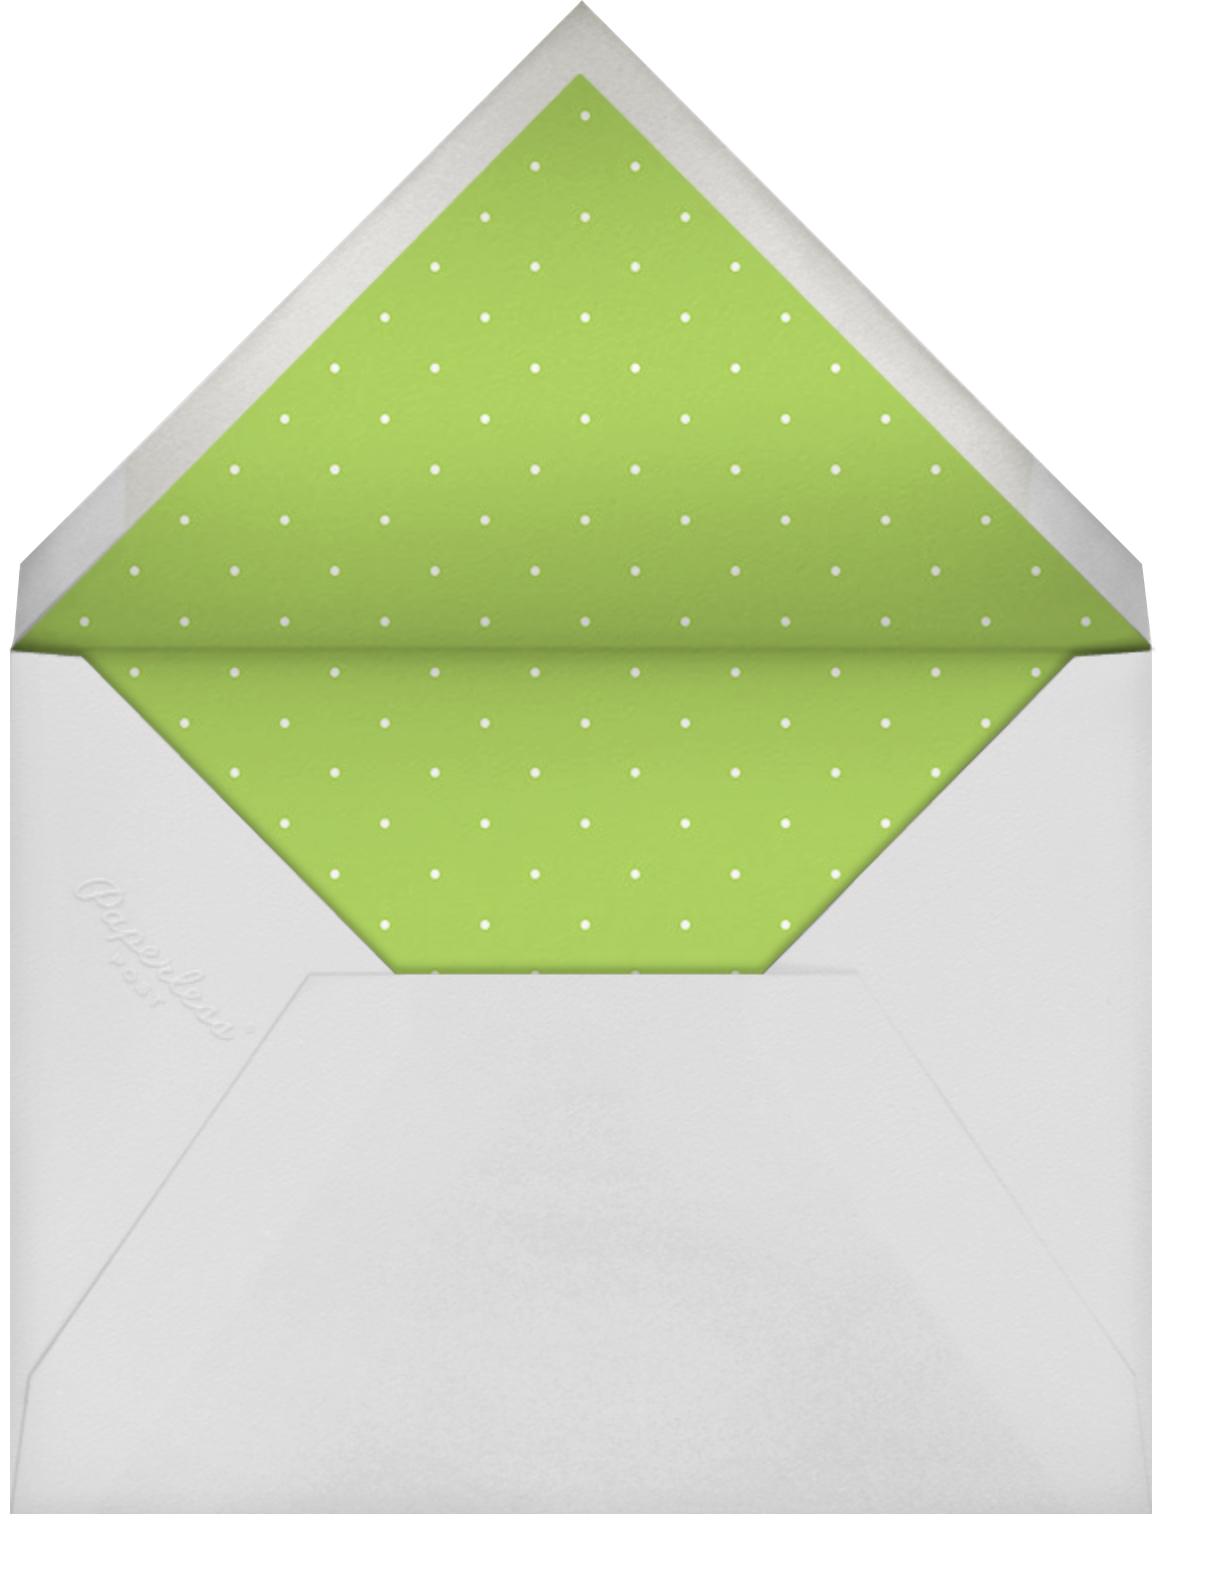 Luck of The Irish - Moss - Mr. Boddington's Studio - St. Patrick's Day - envelope back